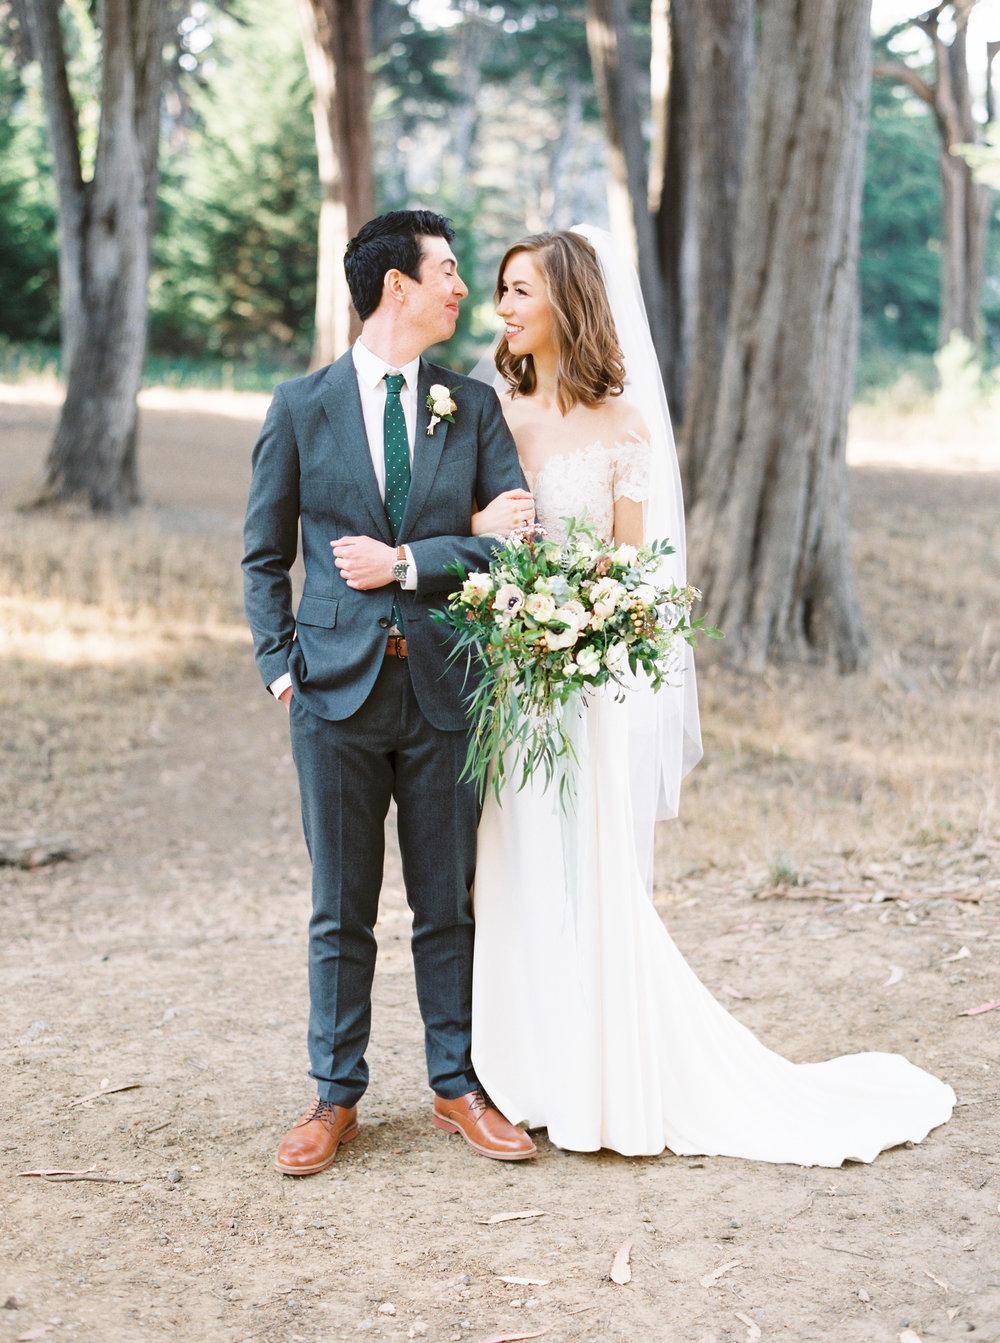 Log-cabin-wedding-in-presidio-san-francisco-california-desintation-wedding-photography-37.jpg